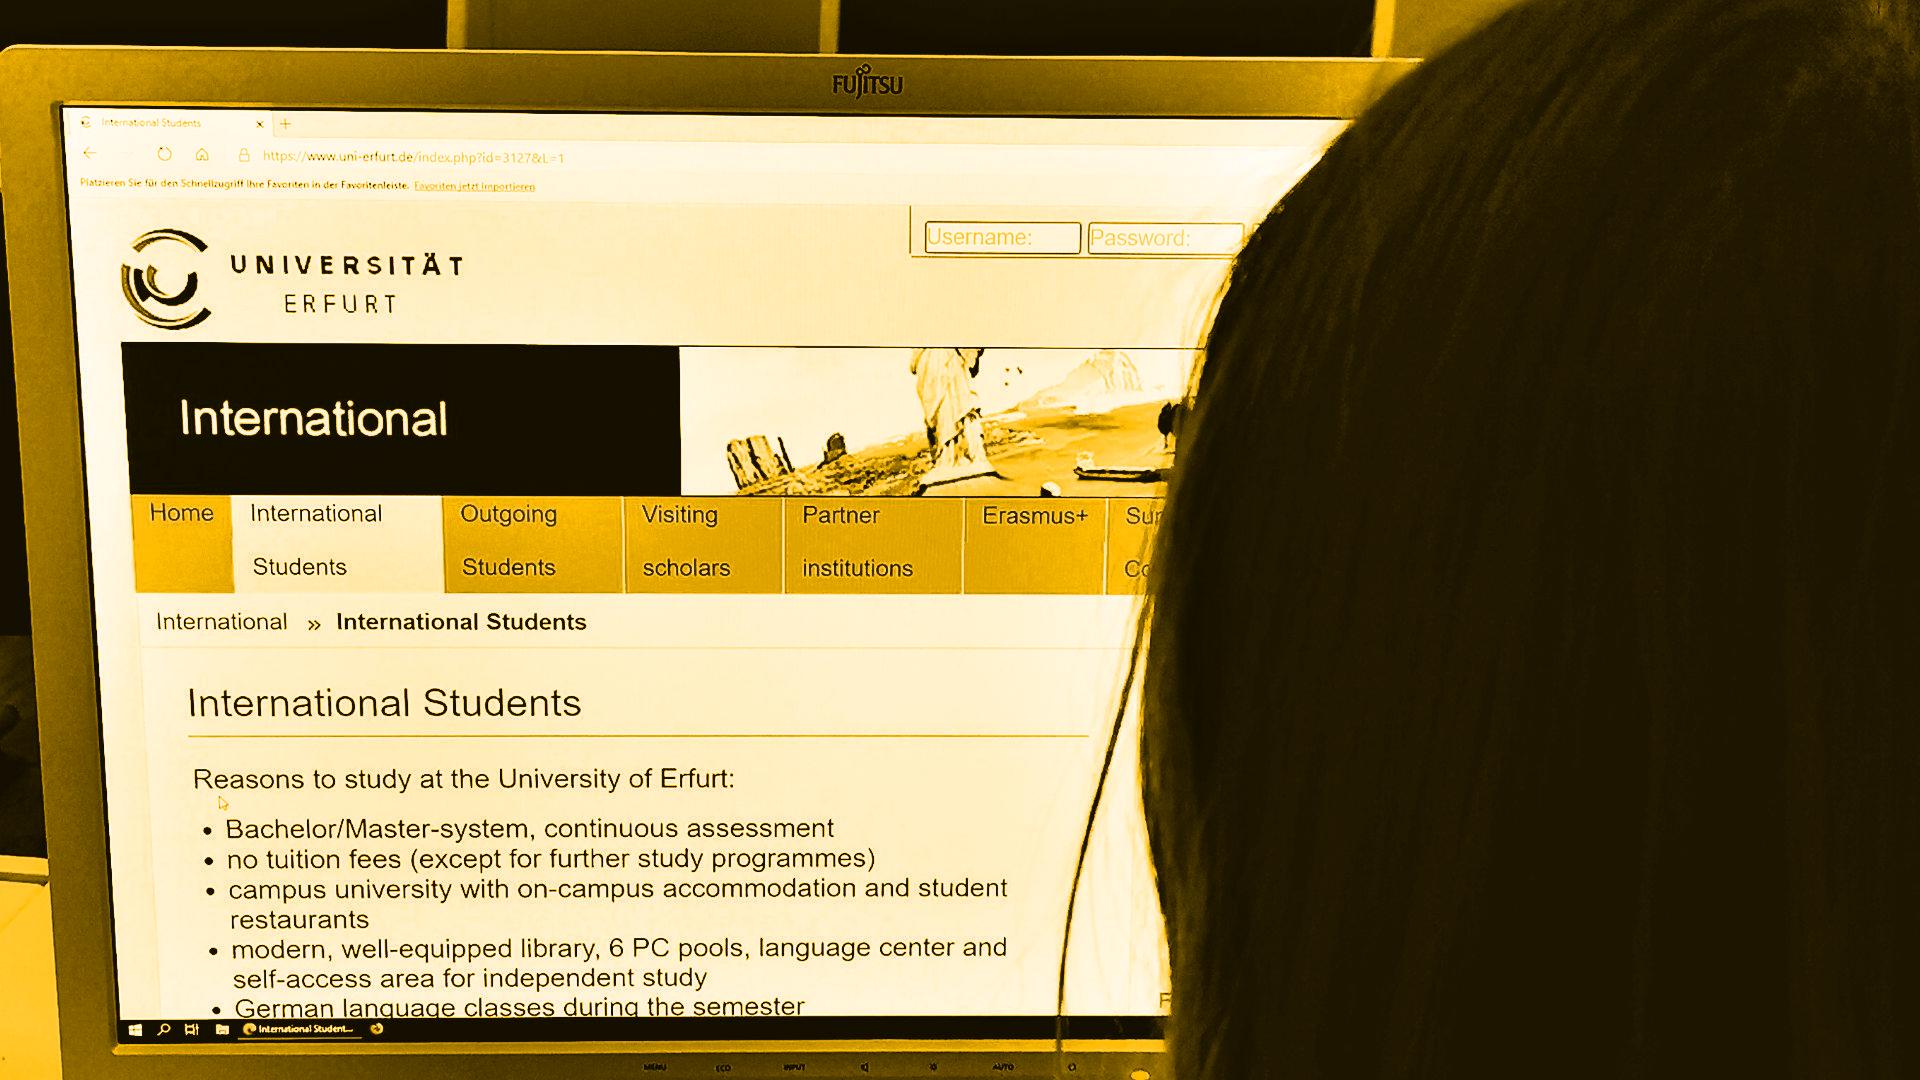 Internationalität an der Uni Erfurt wird groß geschrieben